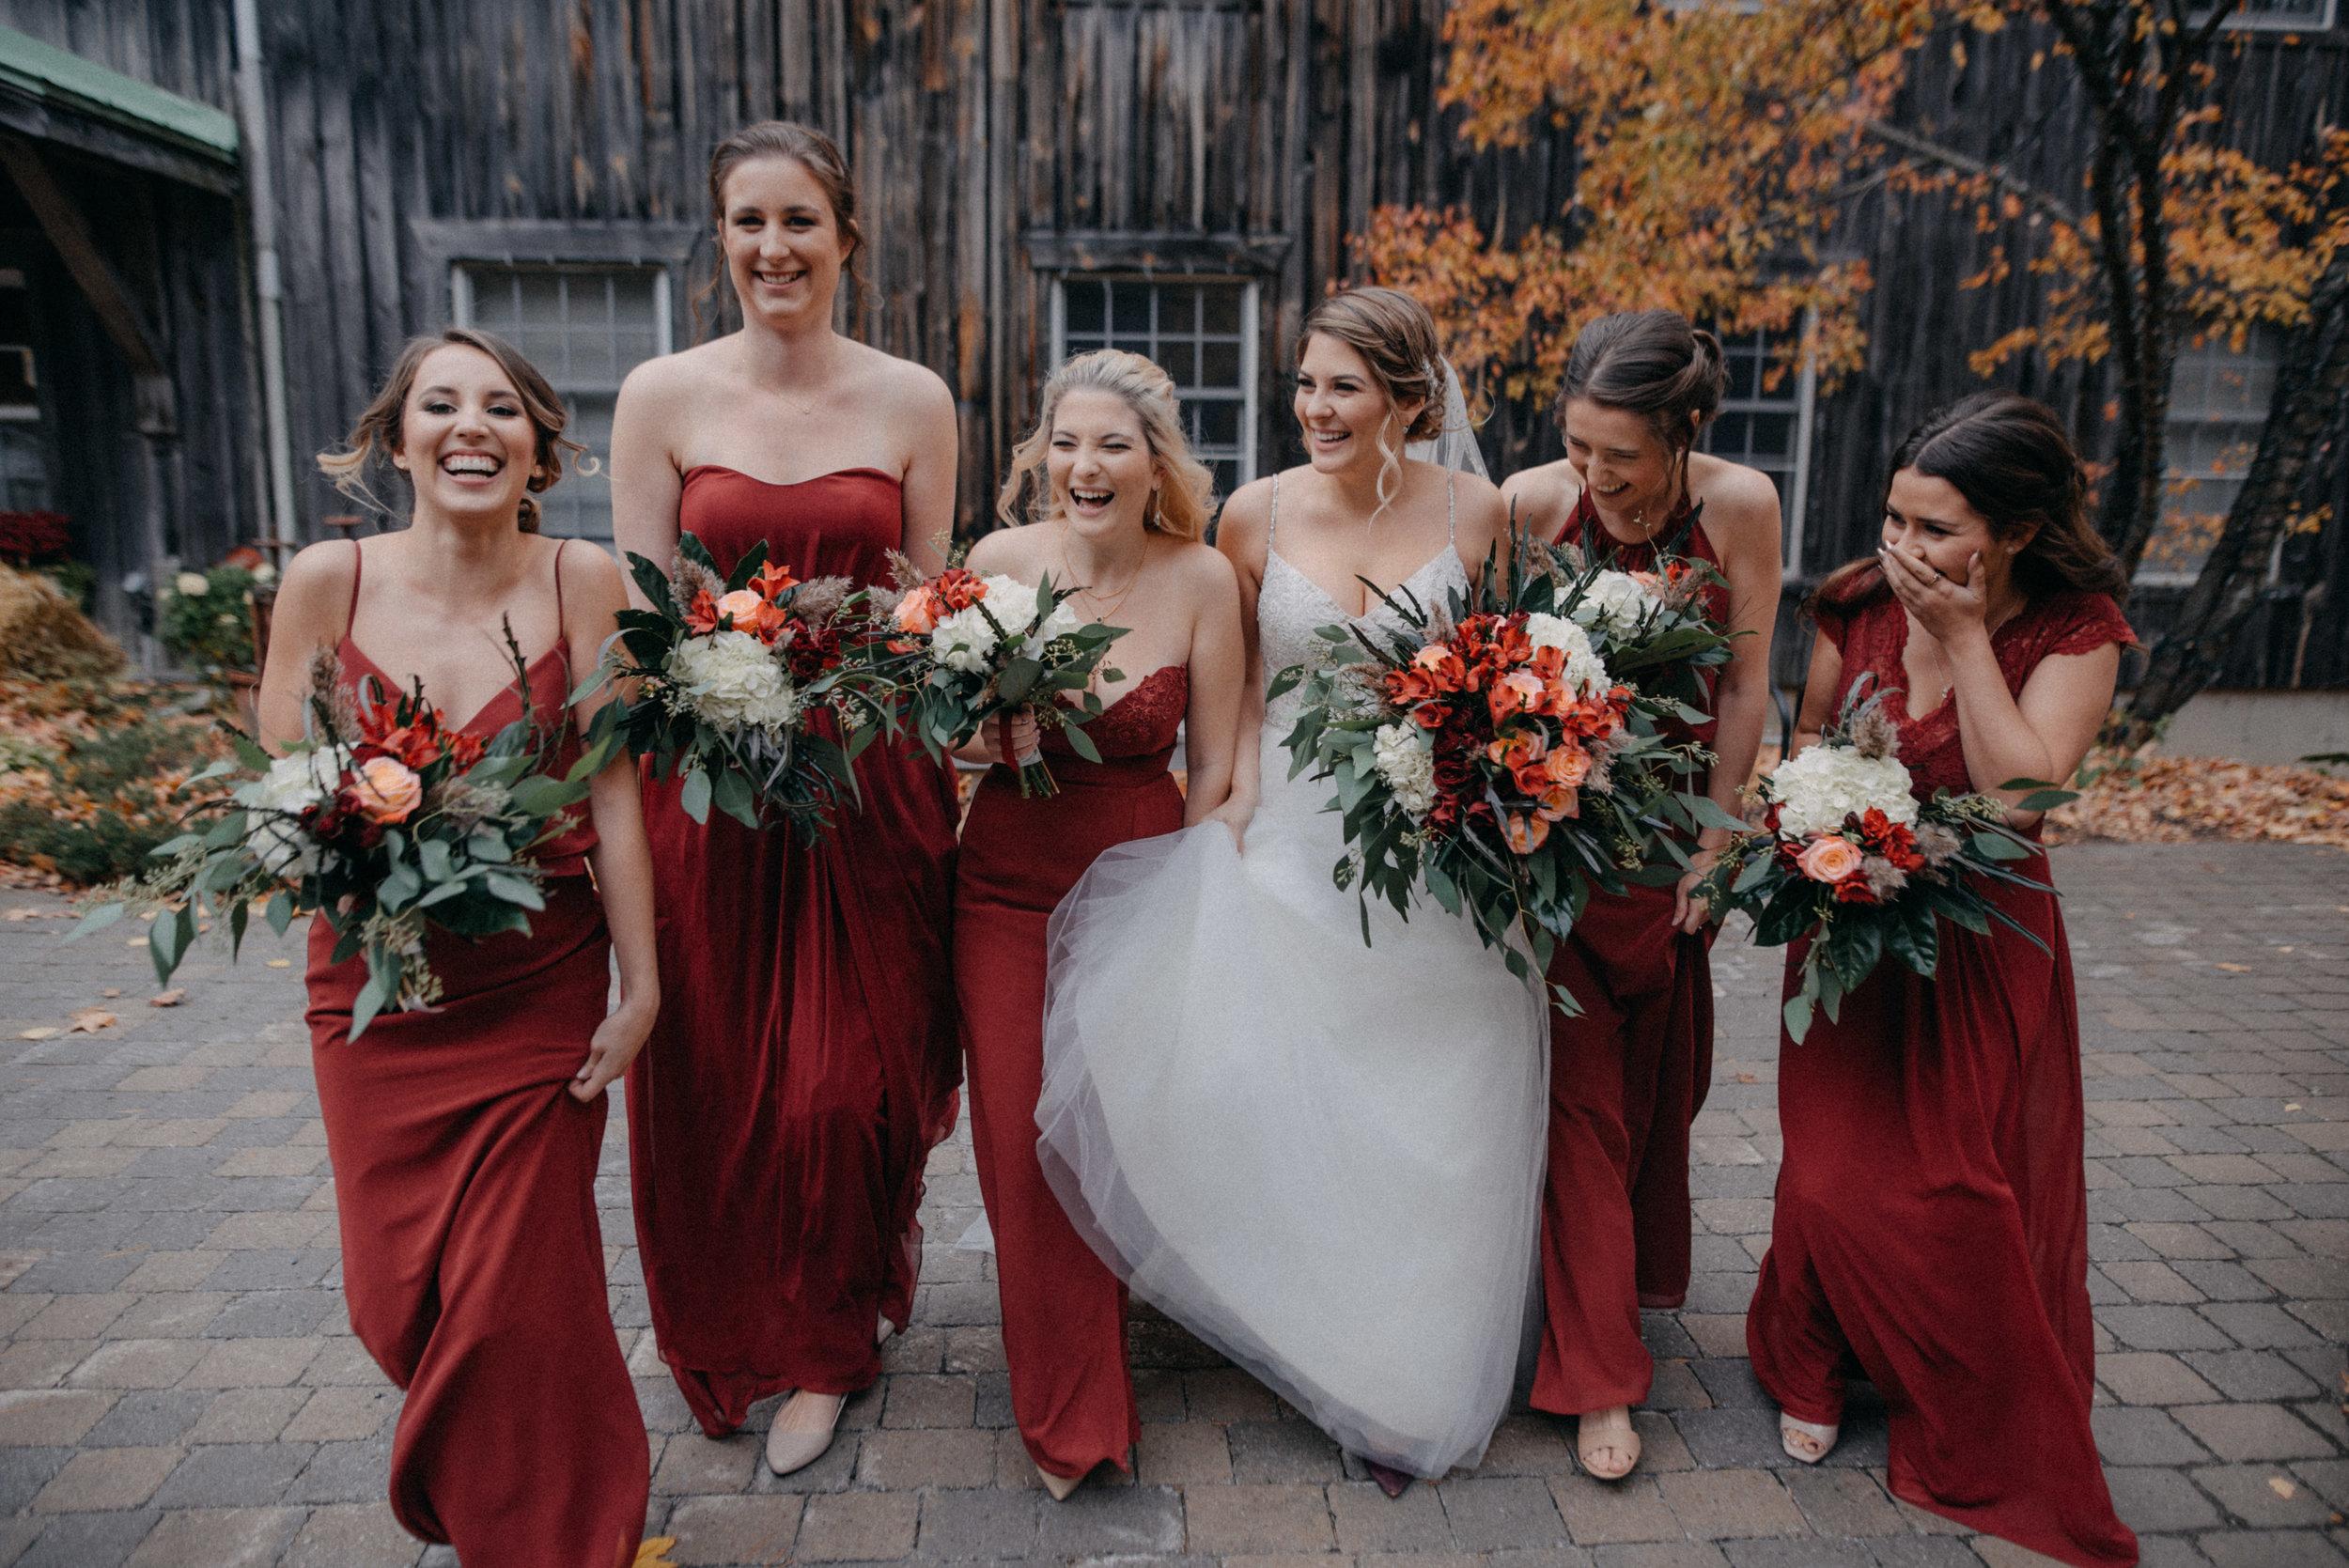 photographe_gatineau_mariage_ottawa_photographer_wedding_natasha_liard_photo_documentary_candid_lifestyle_wakefield_mill_red_bridge (45).jpg